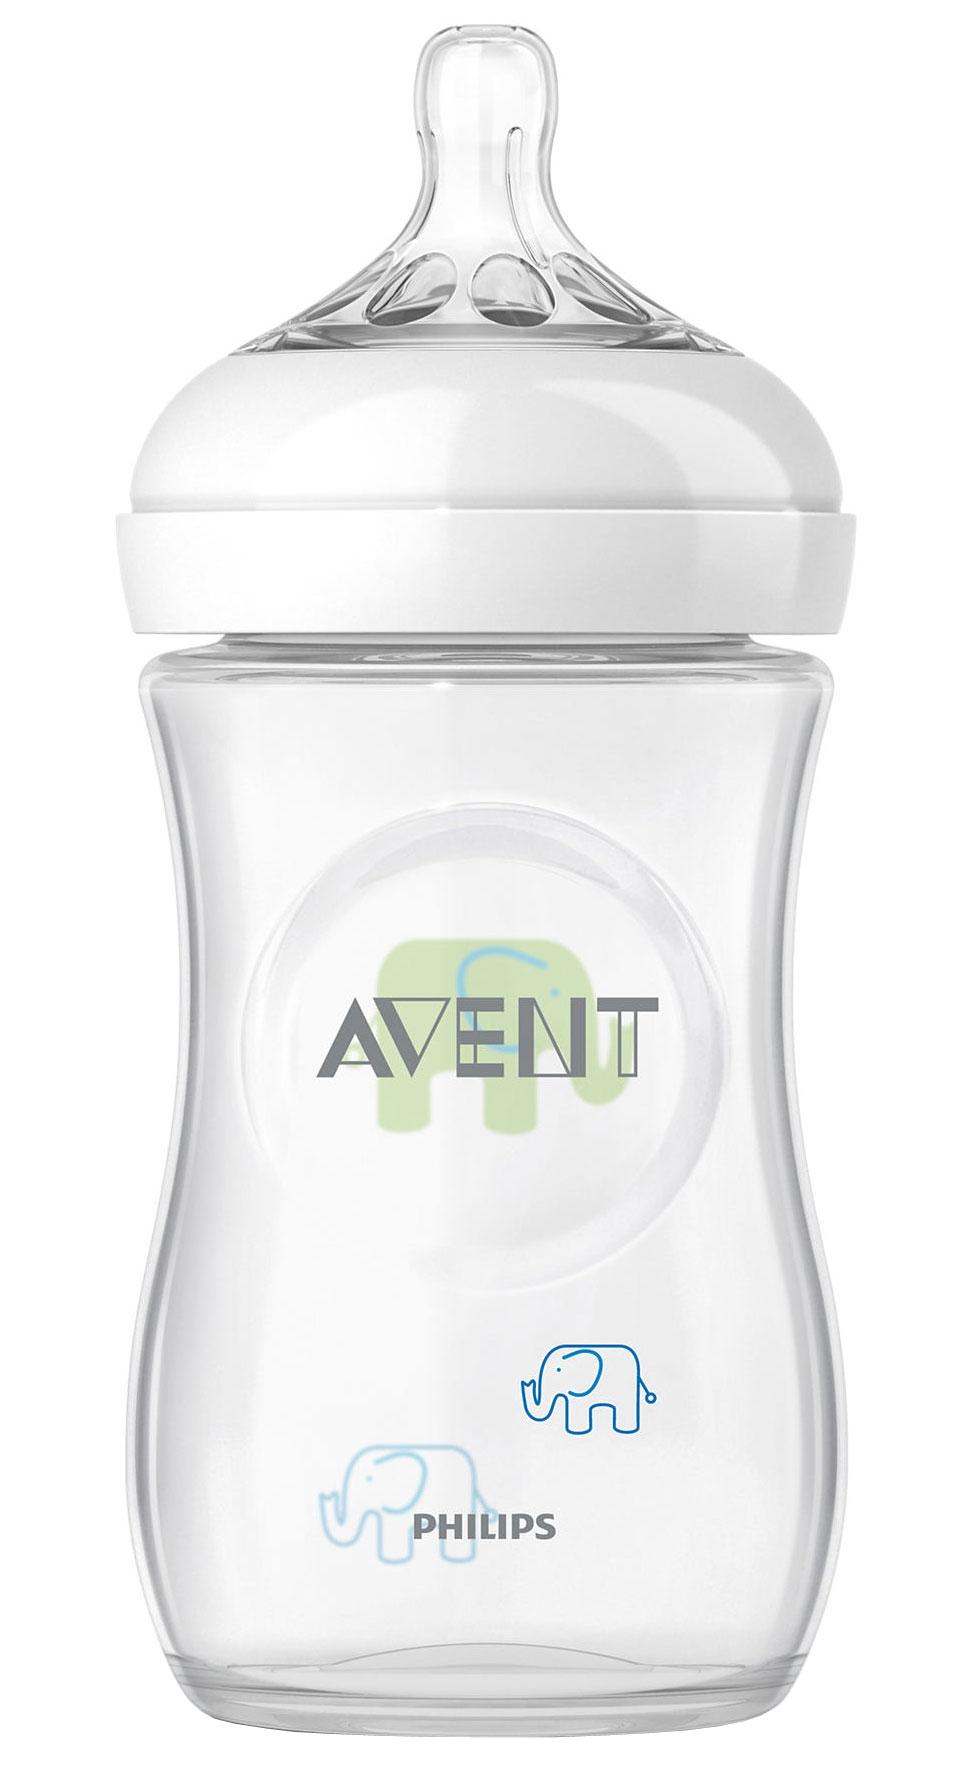 AVENT SCF627/17 260 ml, 1M+ bērnu barošanas pudelīte